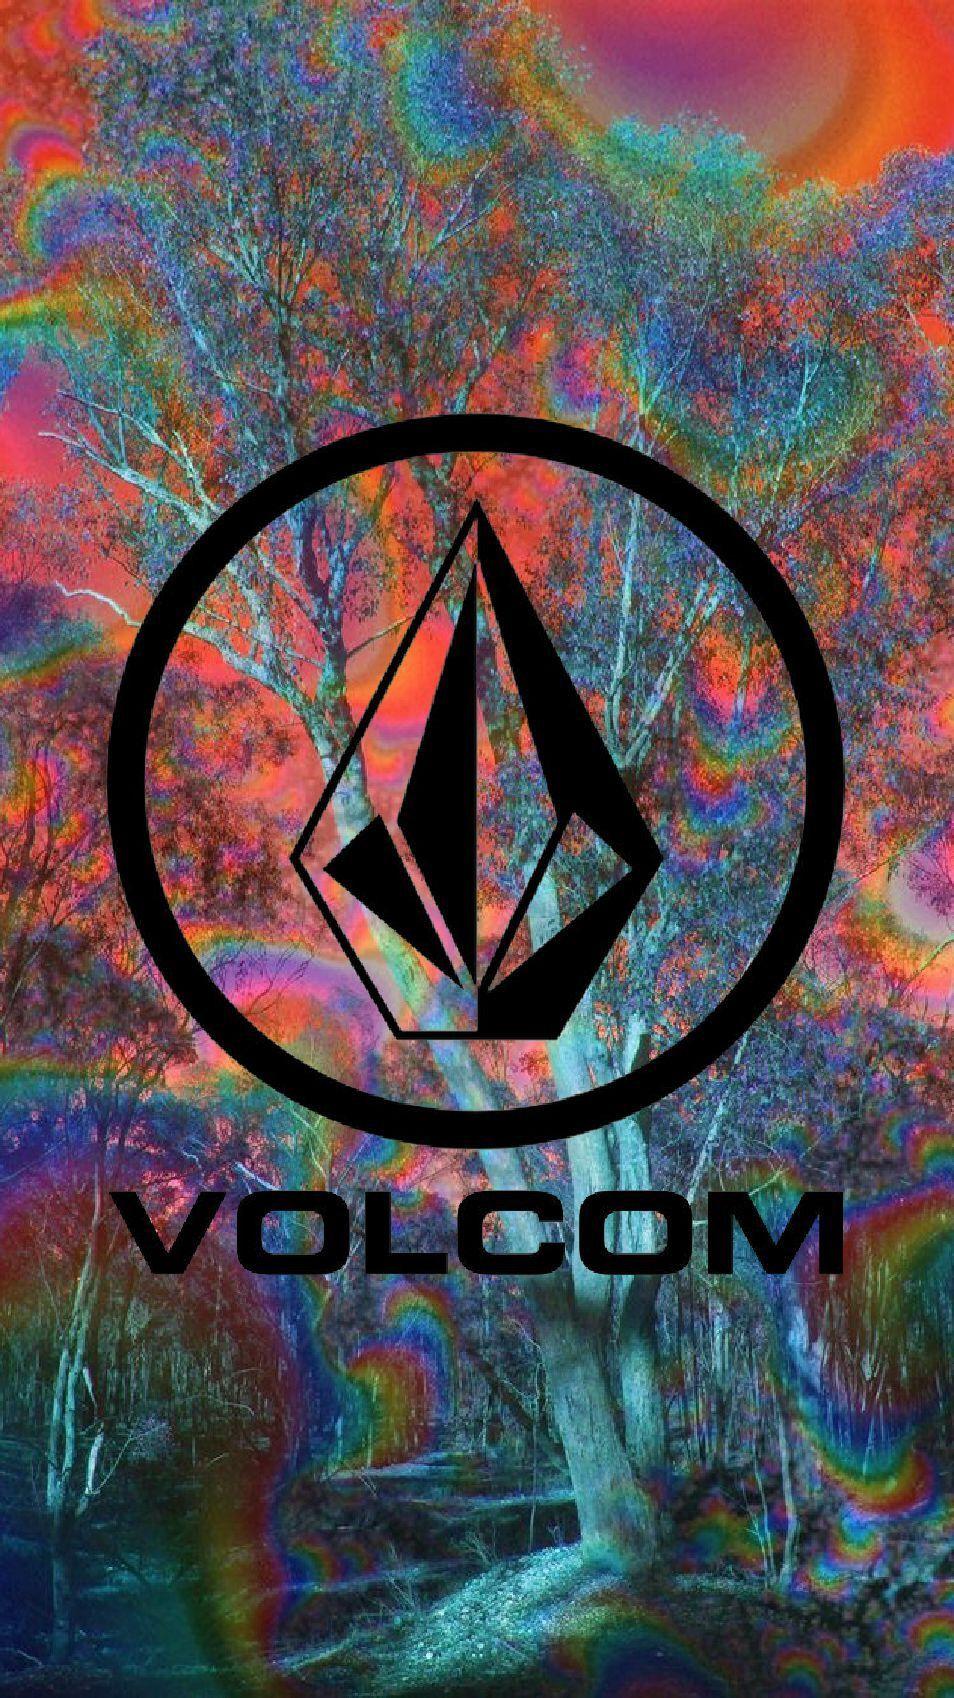 Volcom Photo By Lalafees Publik Stuntz Photobucket Logo Wallpaper Hd Picture Logo Edgy Wallpaper